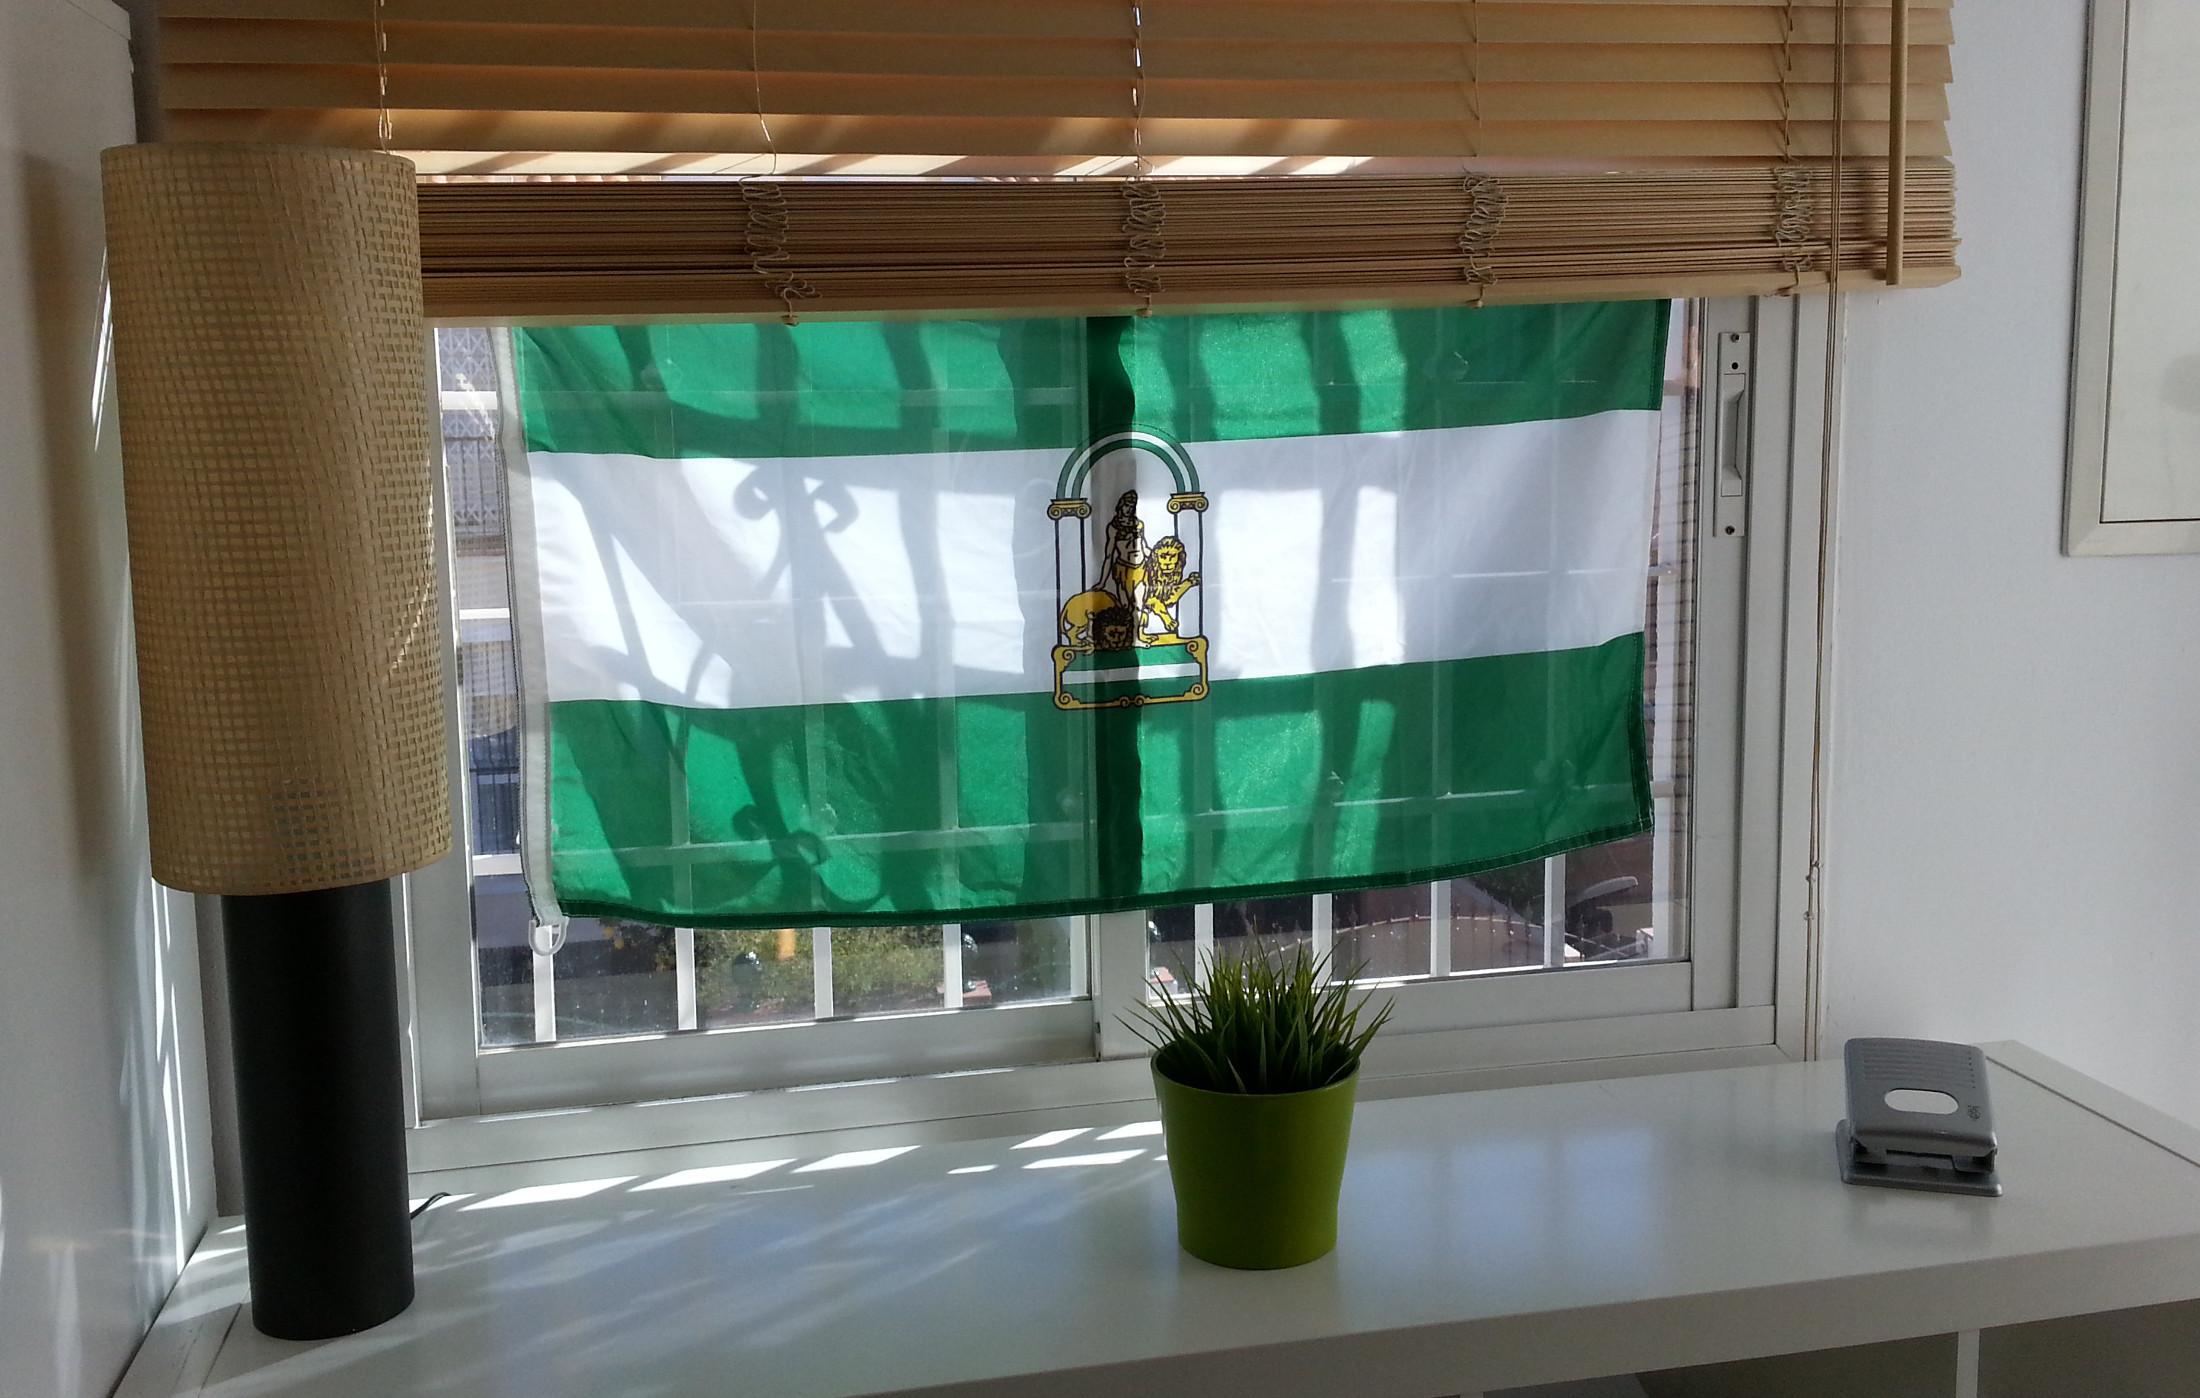 Bandera de Andaluc�a C/E